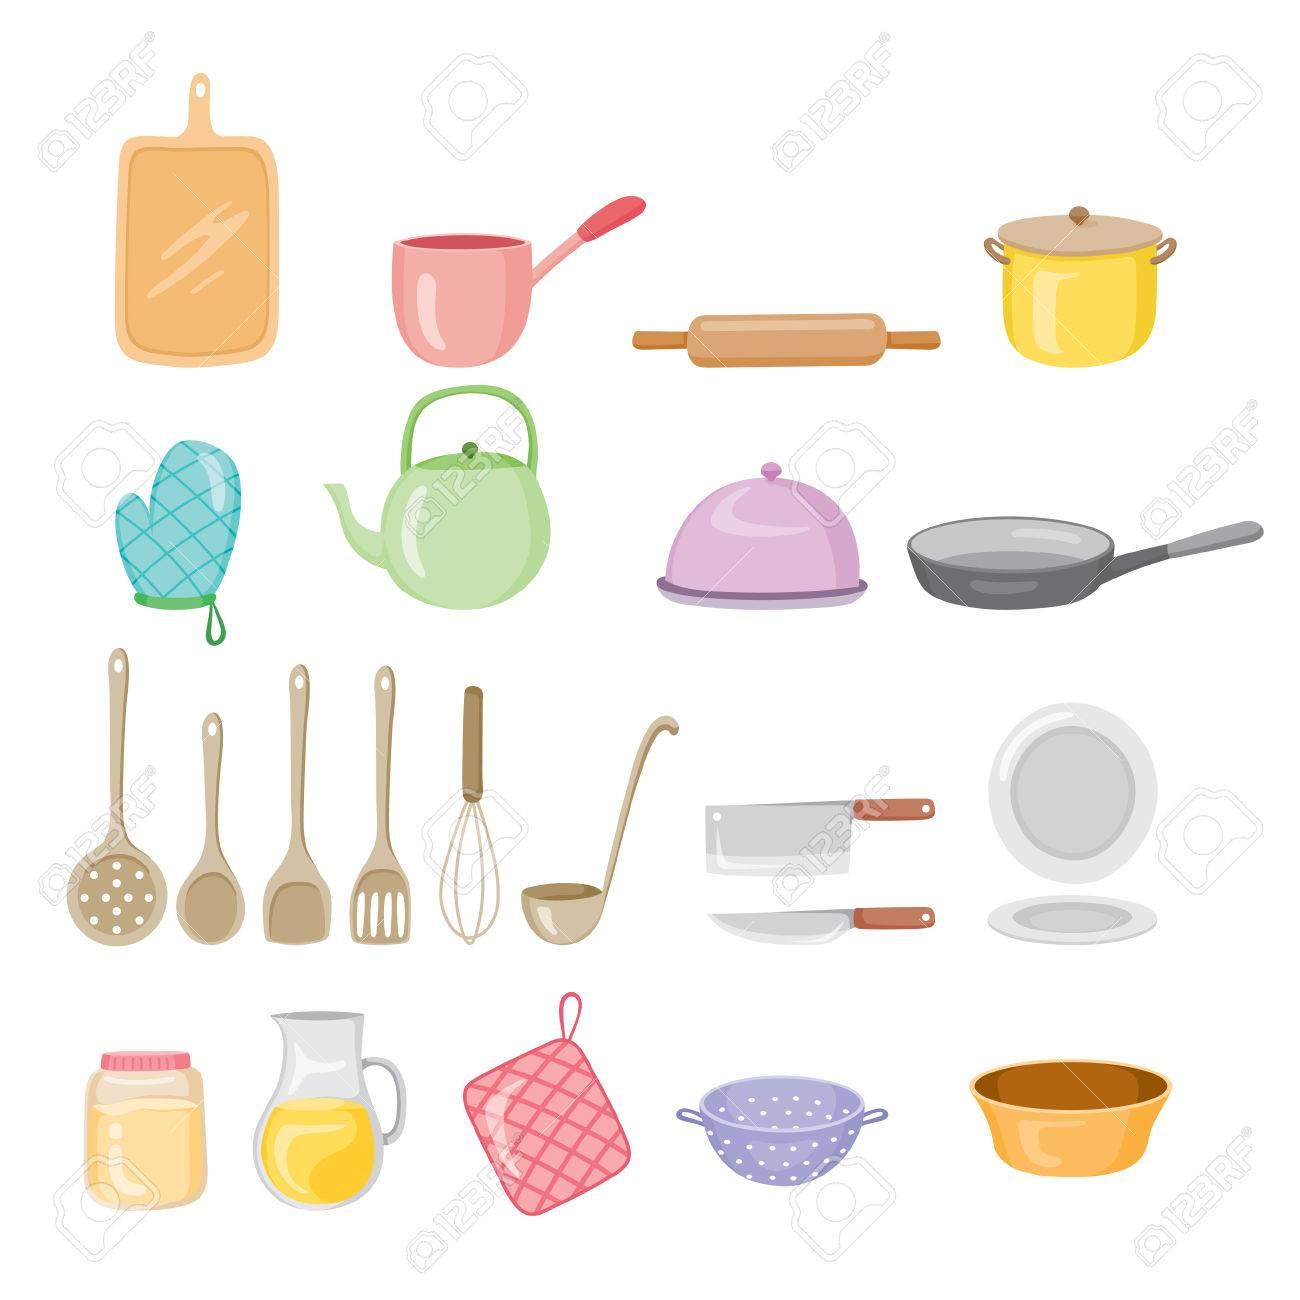 Kuchengerate Icons Set Kuche Kuchenutensilien Geschirr Kochen Lebensmittel Backerei Lifestyle Lizenzfrei Nutzbare Vektorgrafiken Clip Arts Illustrationen Image 54343677